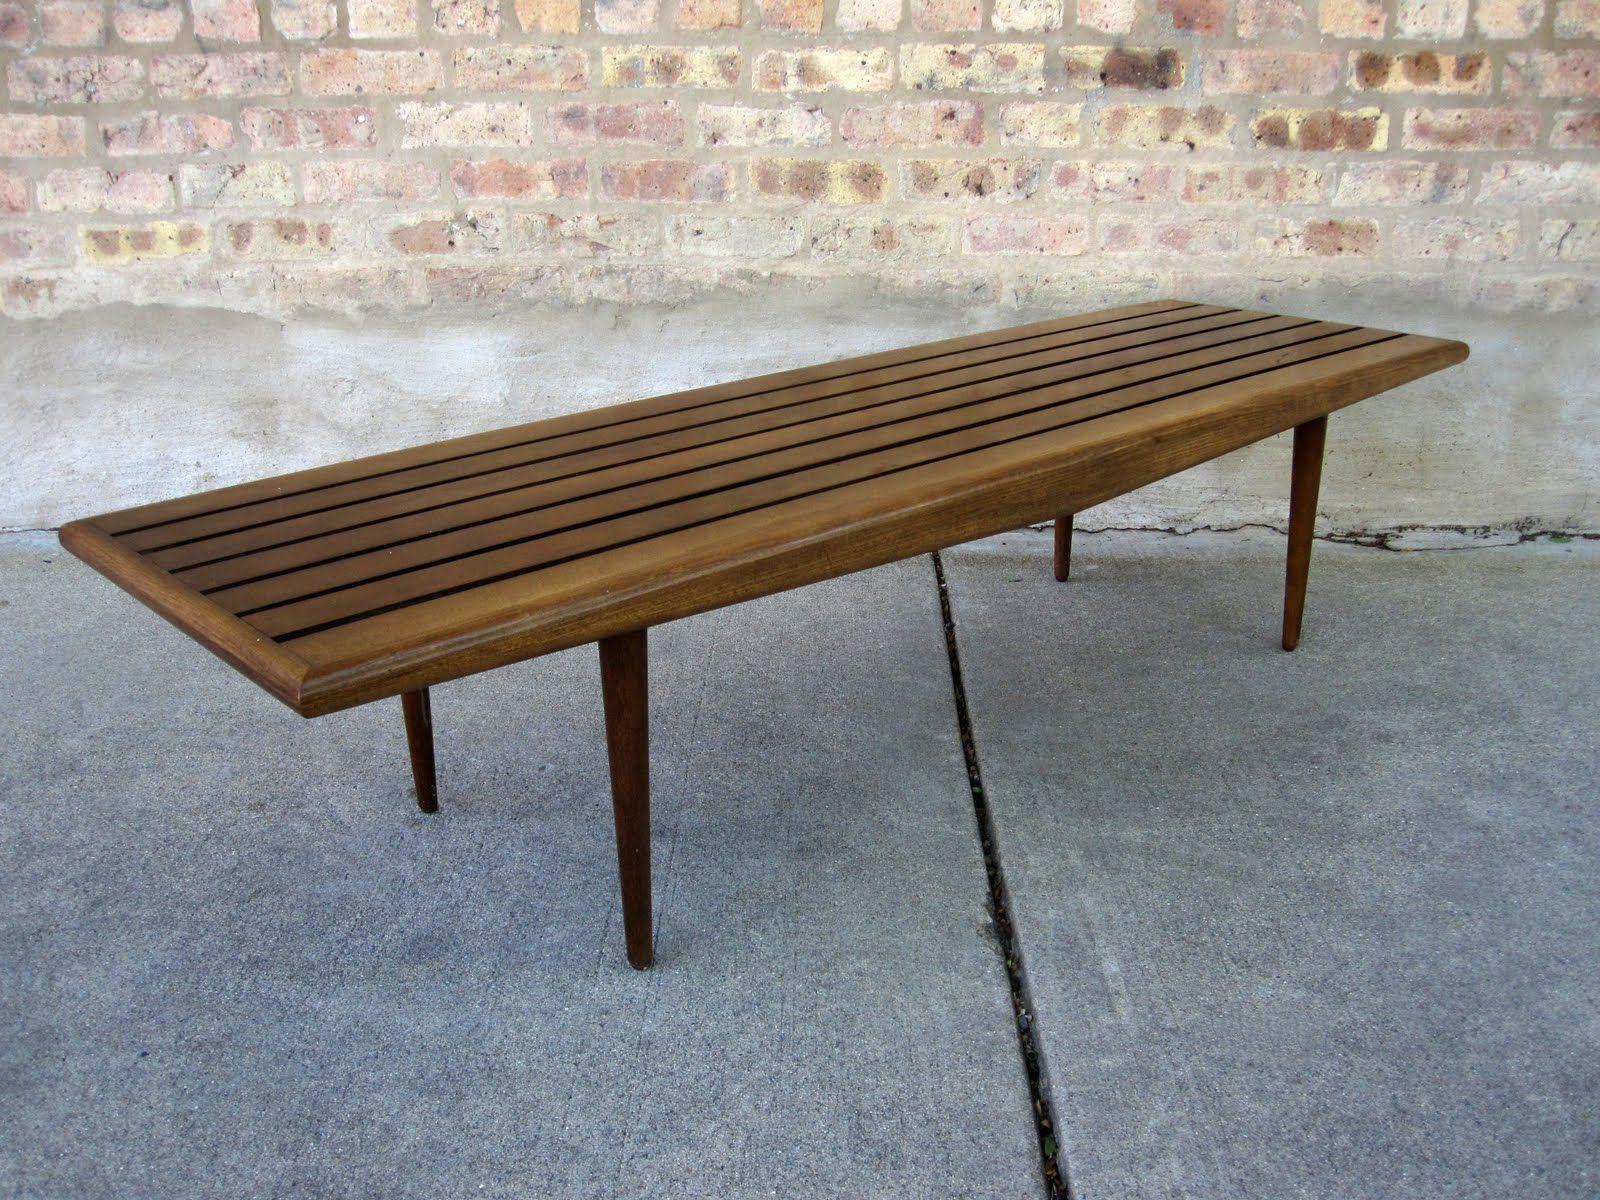 Circa Midcentury Danish Modern Slat Bench Coffee Table Want